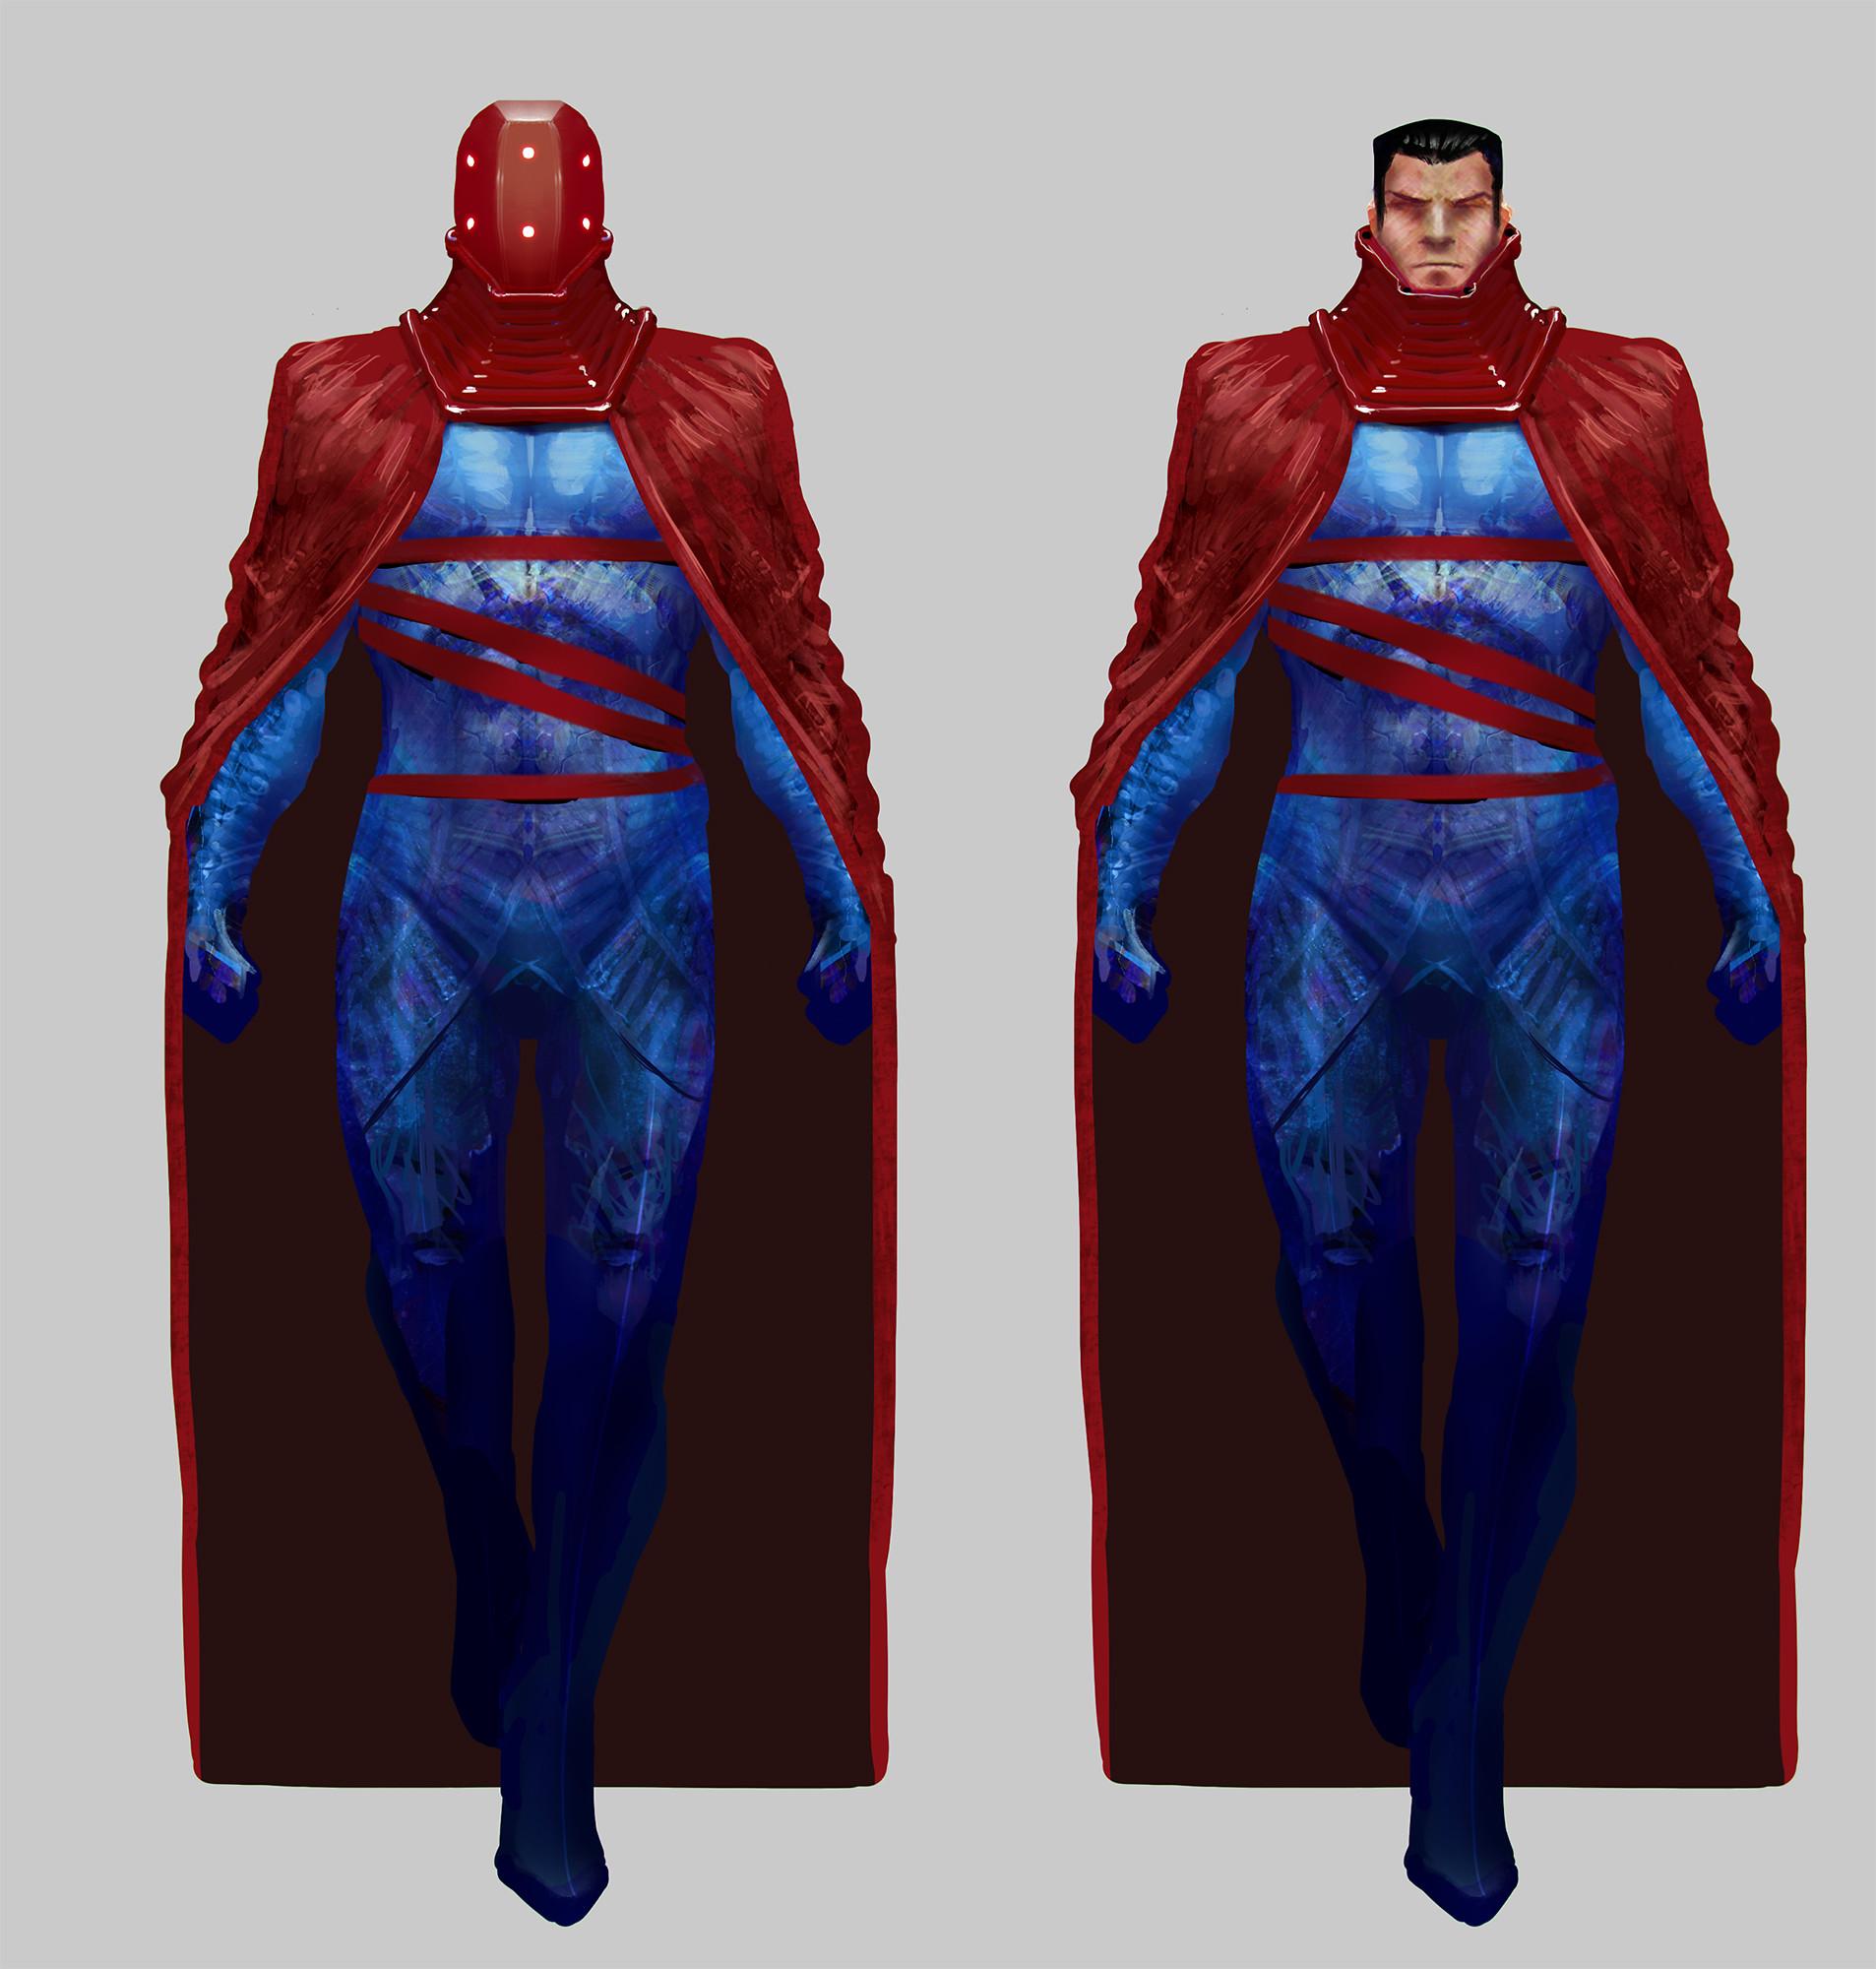 Chenthooran nambiarooran superman5 bourland